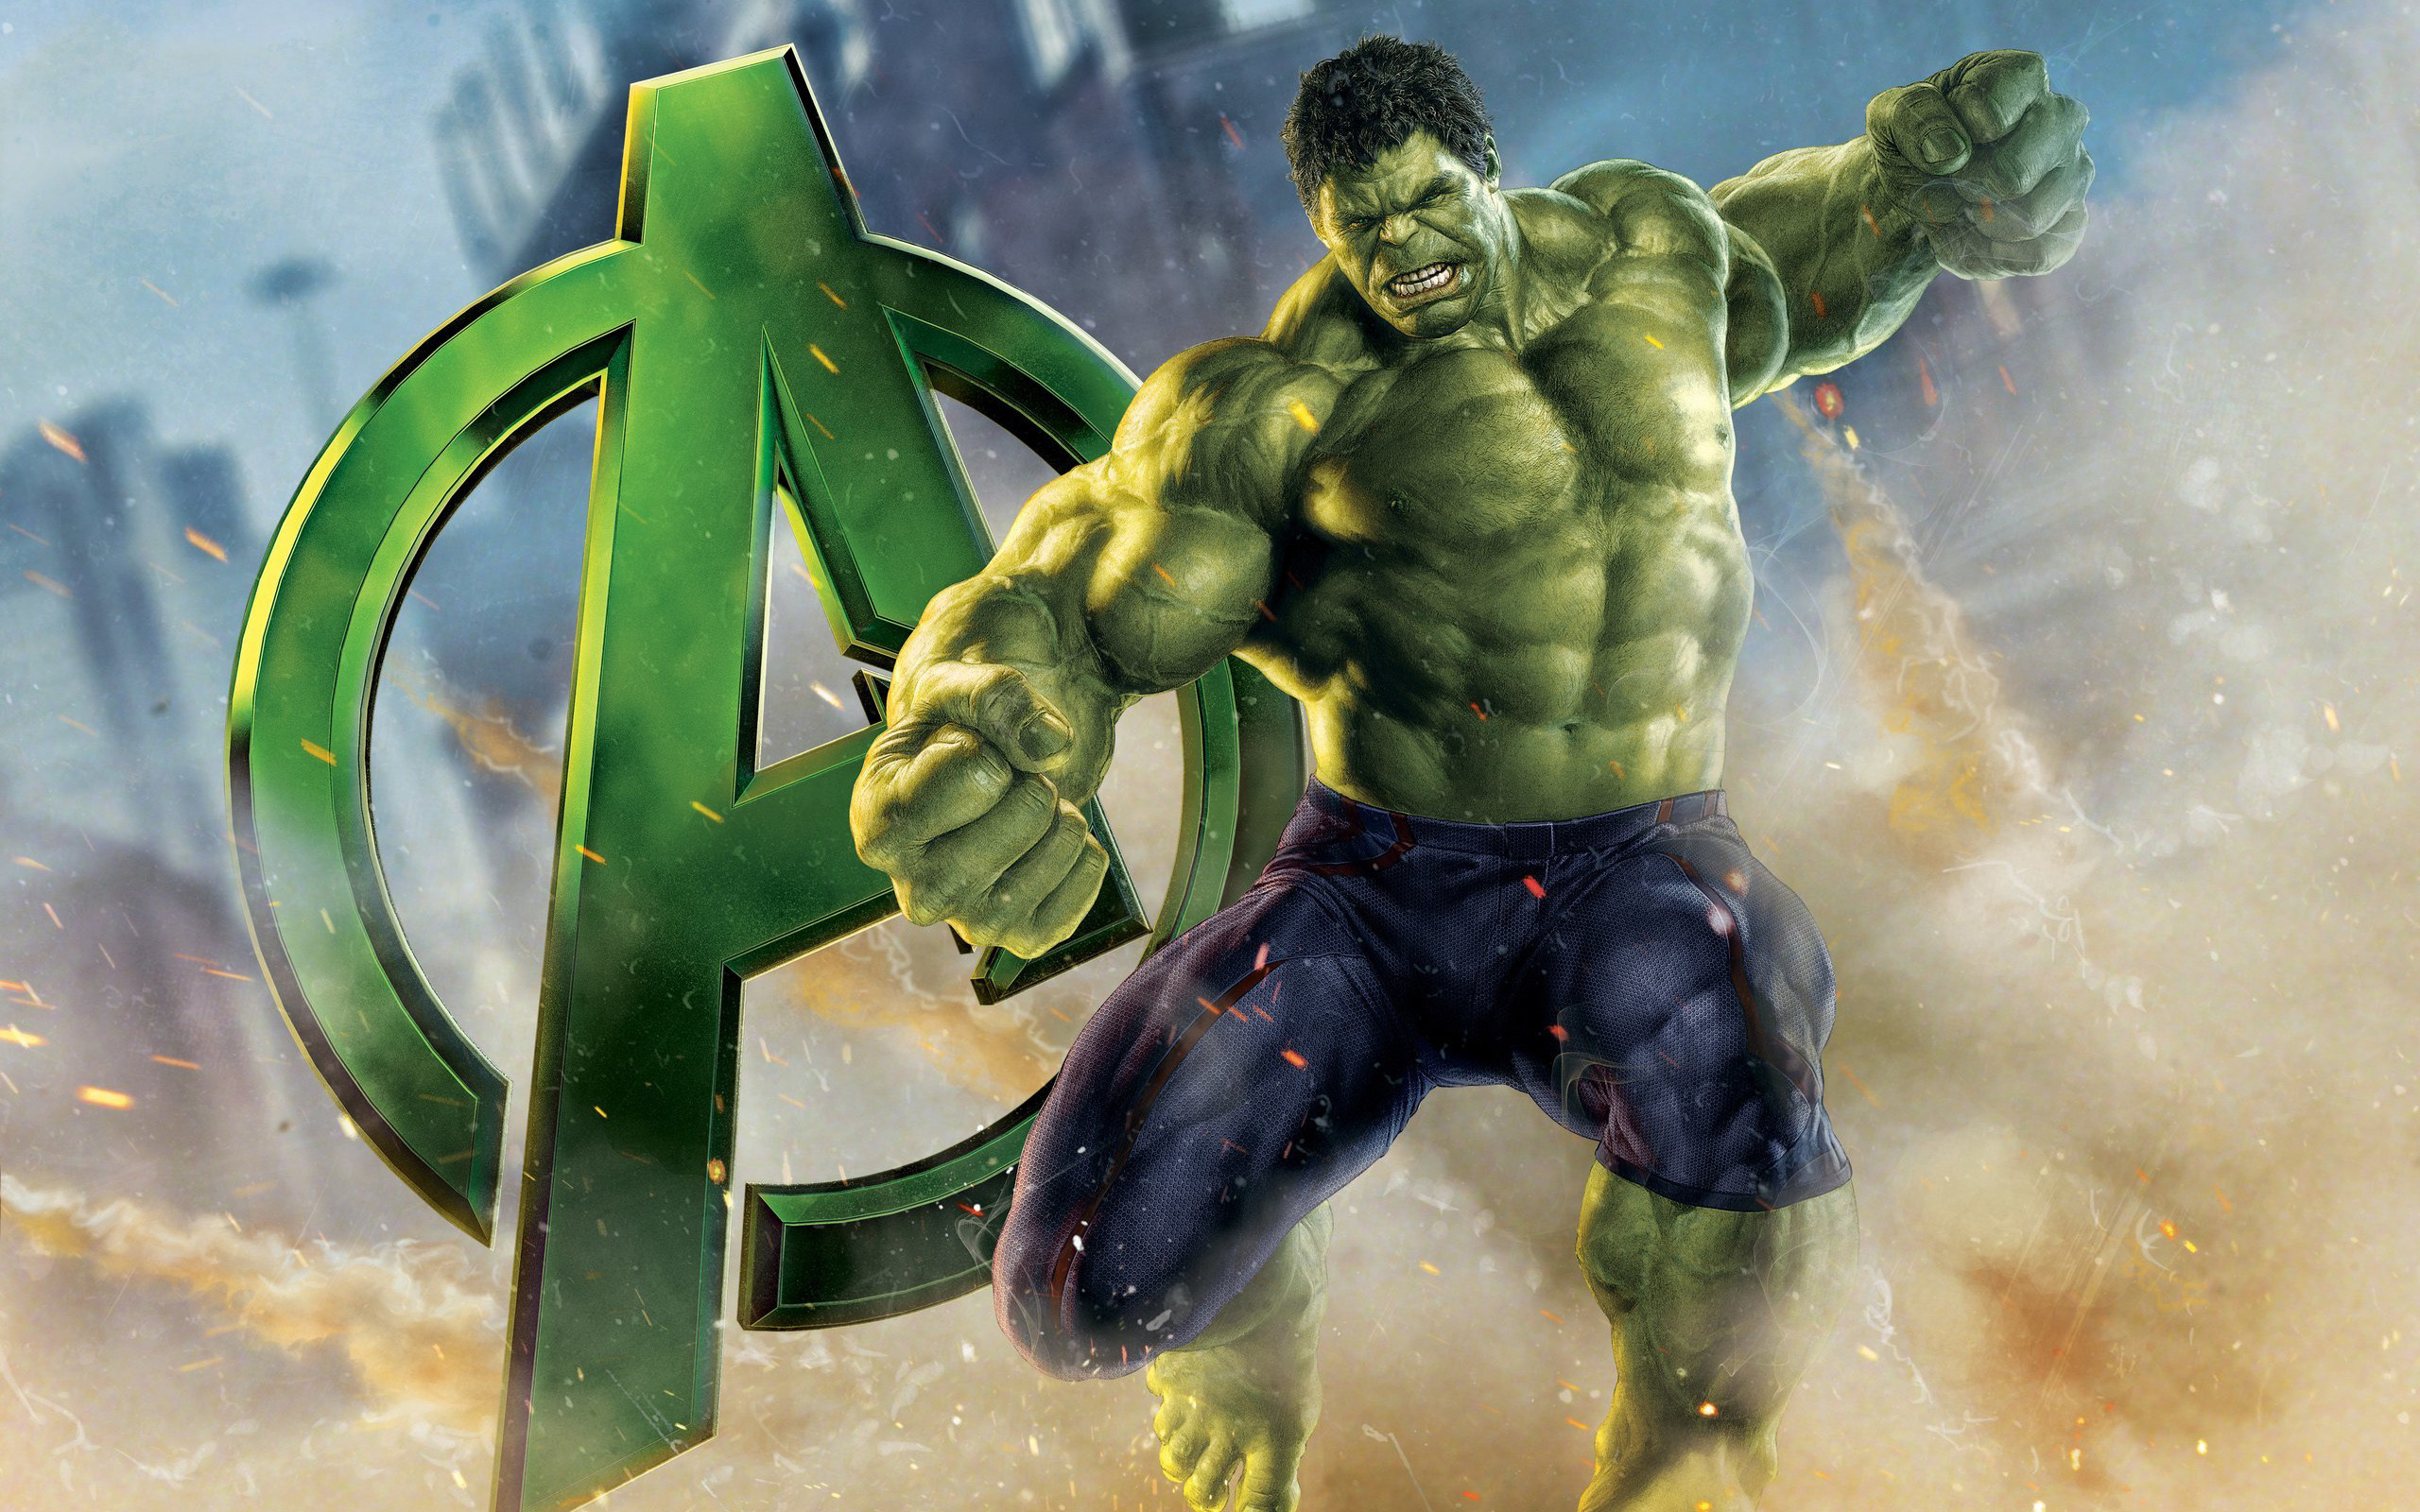 Res: 2560x1600, Avengers Hulk